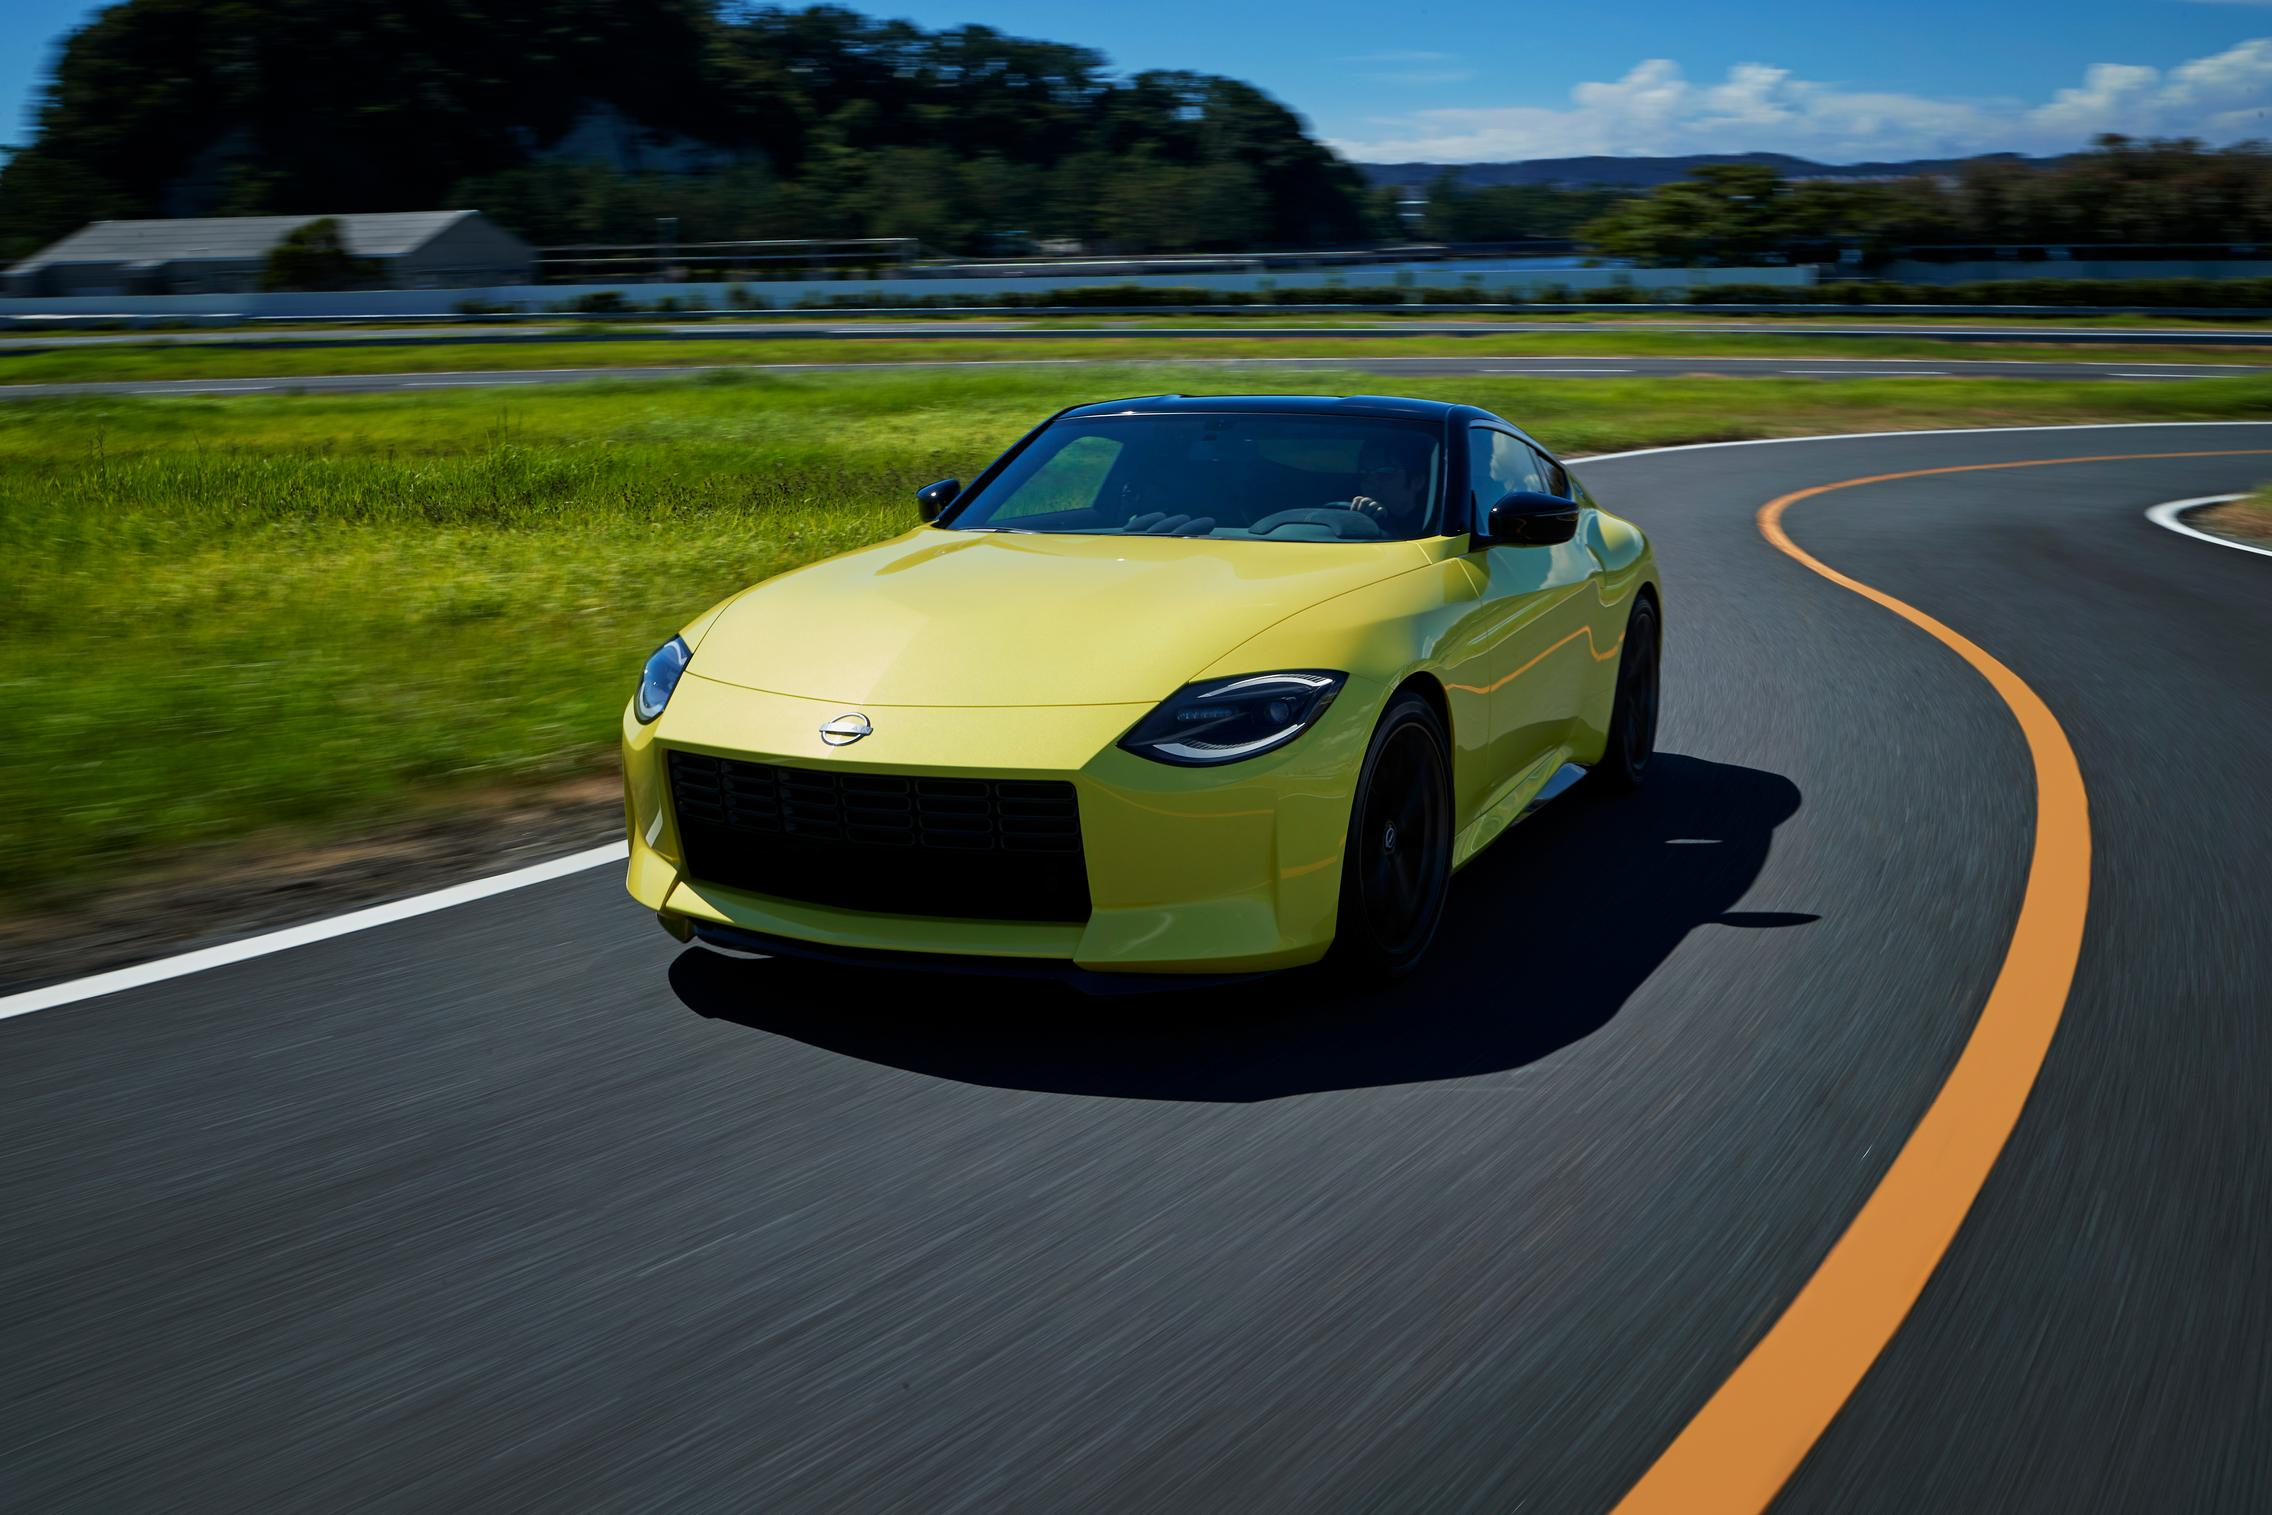 Pearlescent Car Paint >> Nissan Z Proto: 7th Generation Z Car Announced - GTspirit